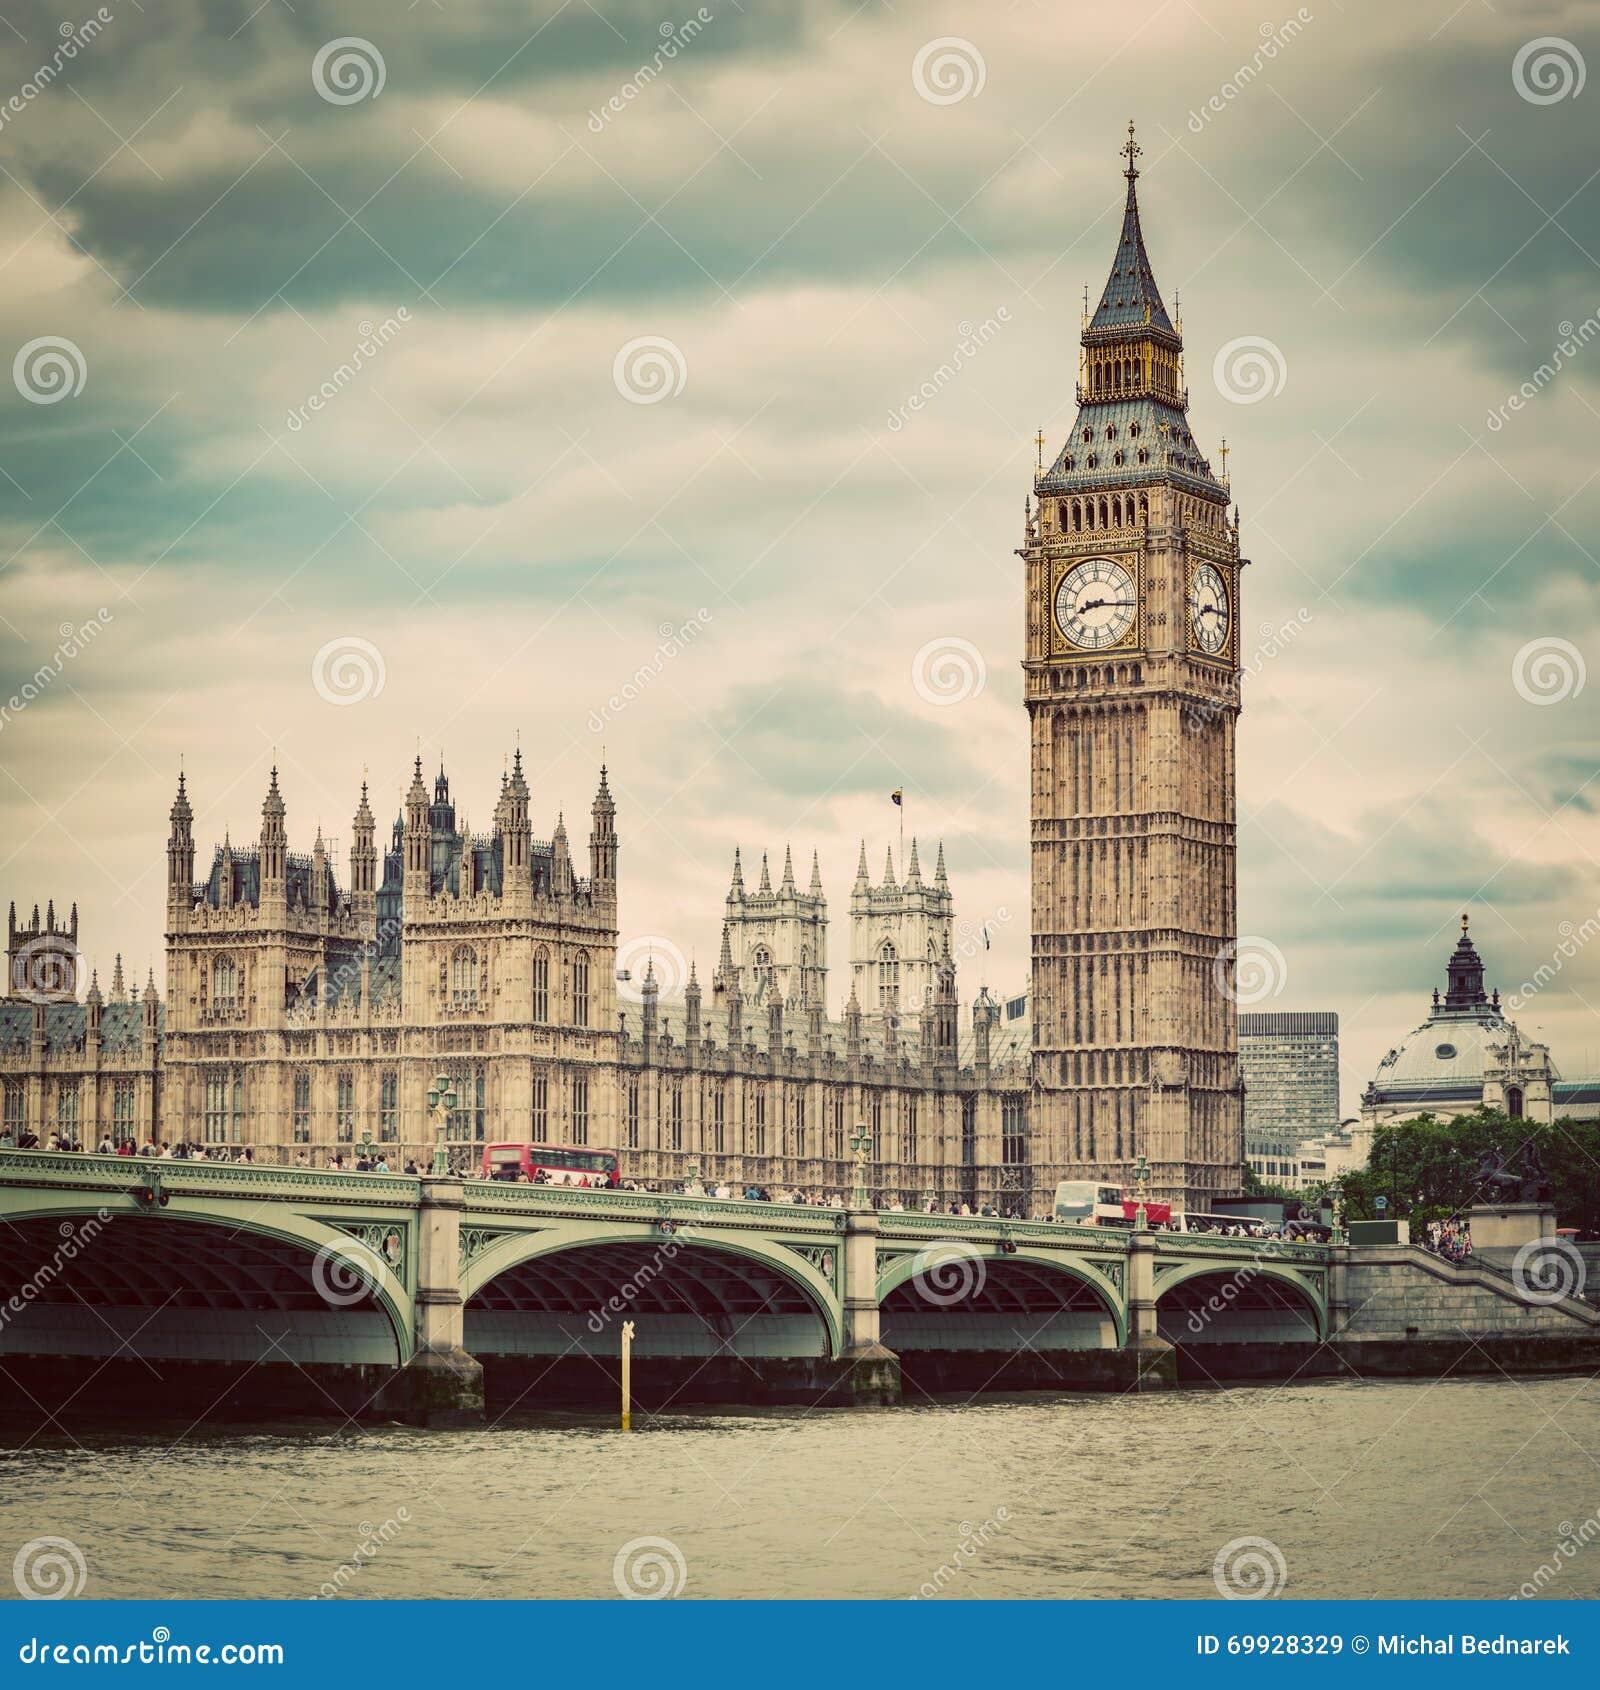 uk Vintage london